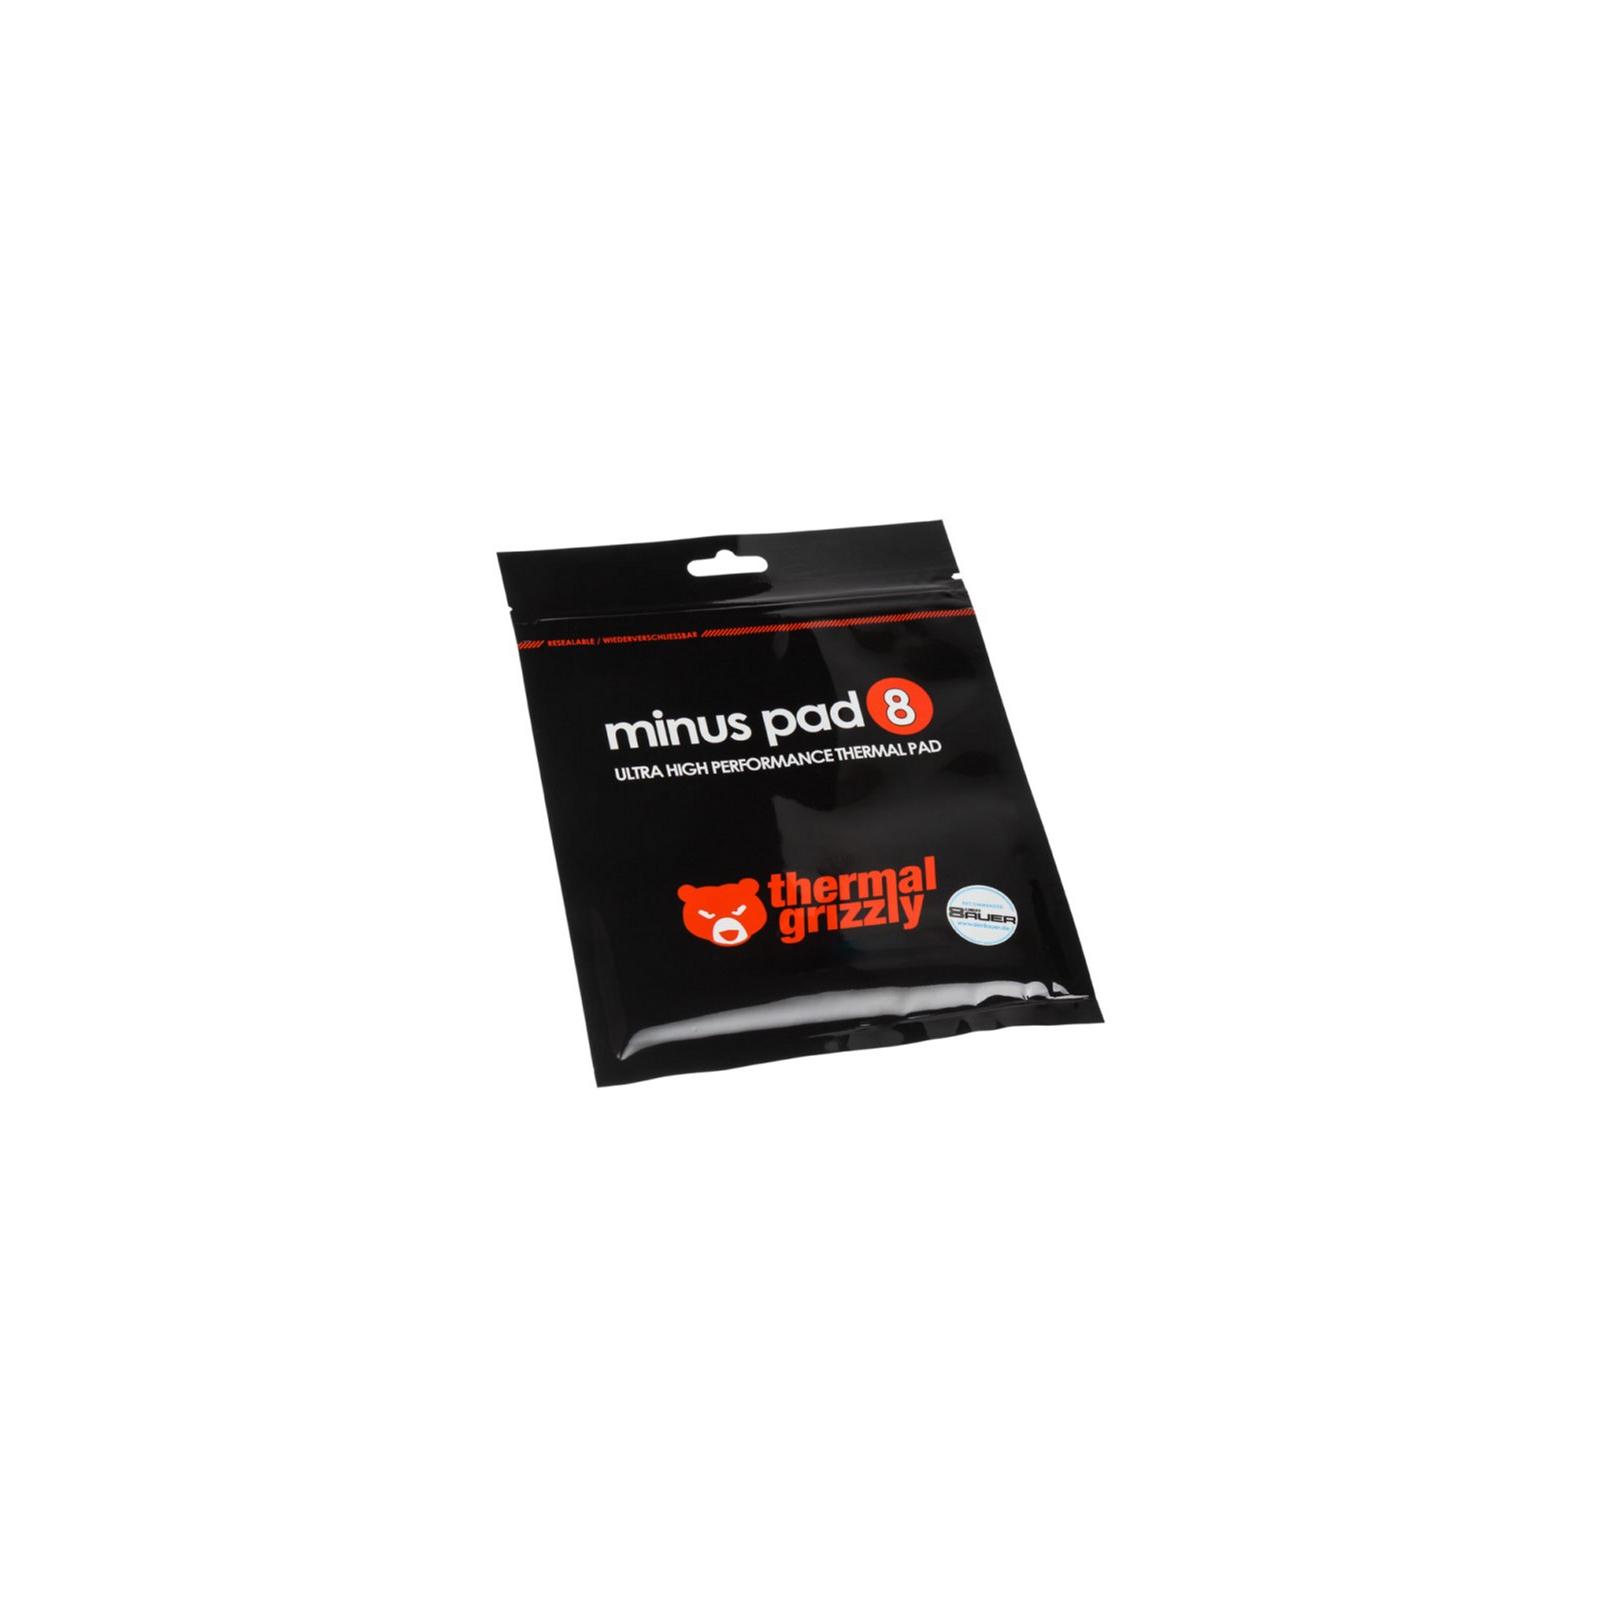 Термопрокладка Thermal Grizzly Minus Pad 8 30x30x0.5 mm (TG-MP8-30-30-05-1R) изображение 2